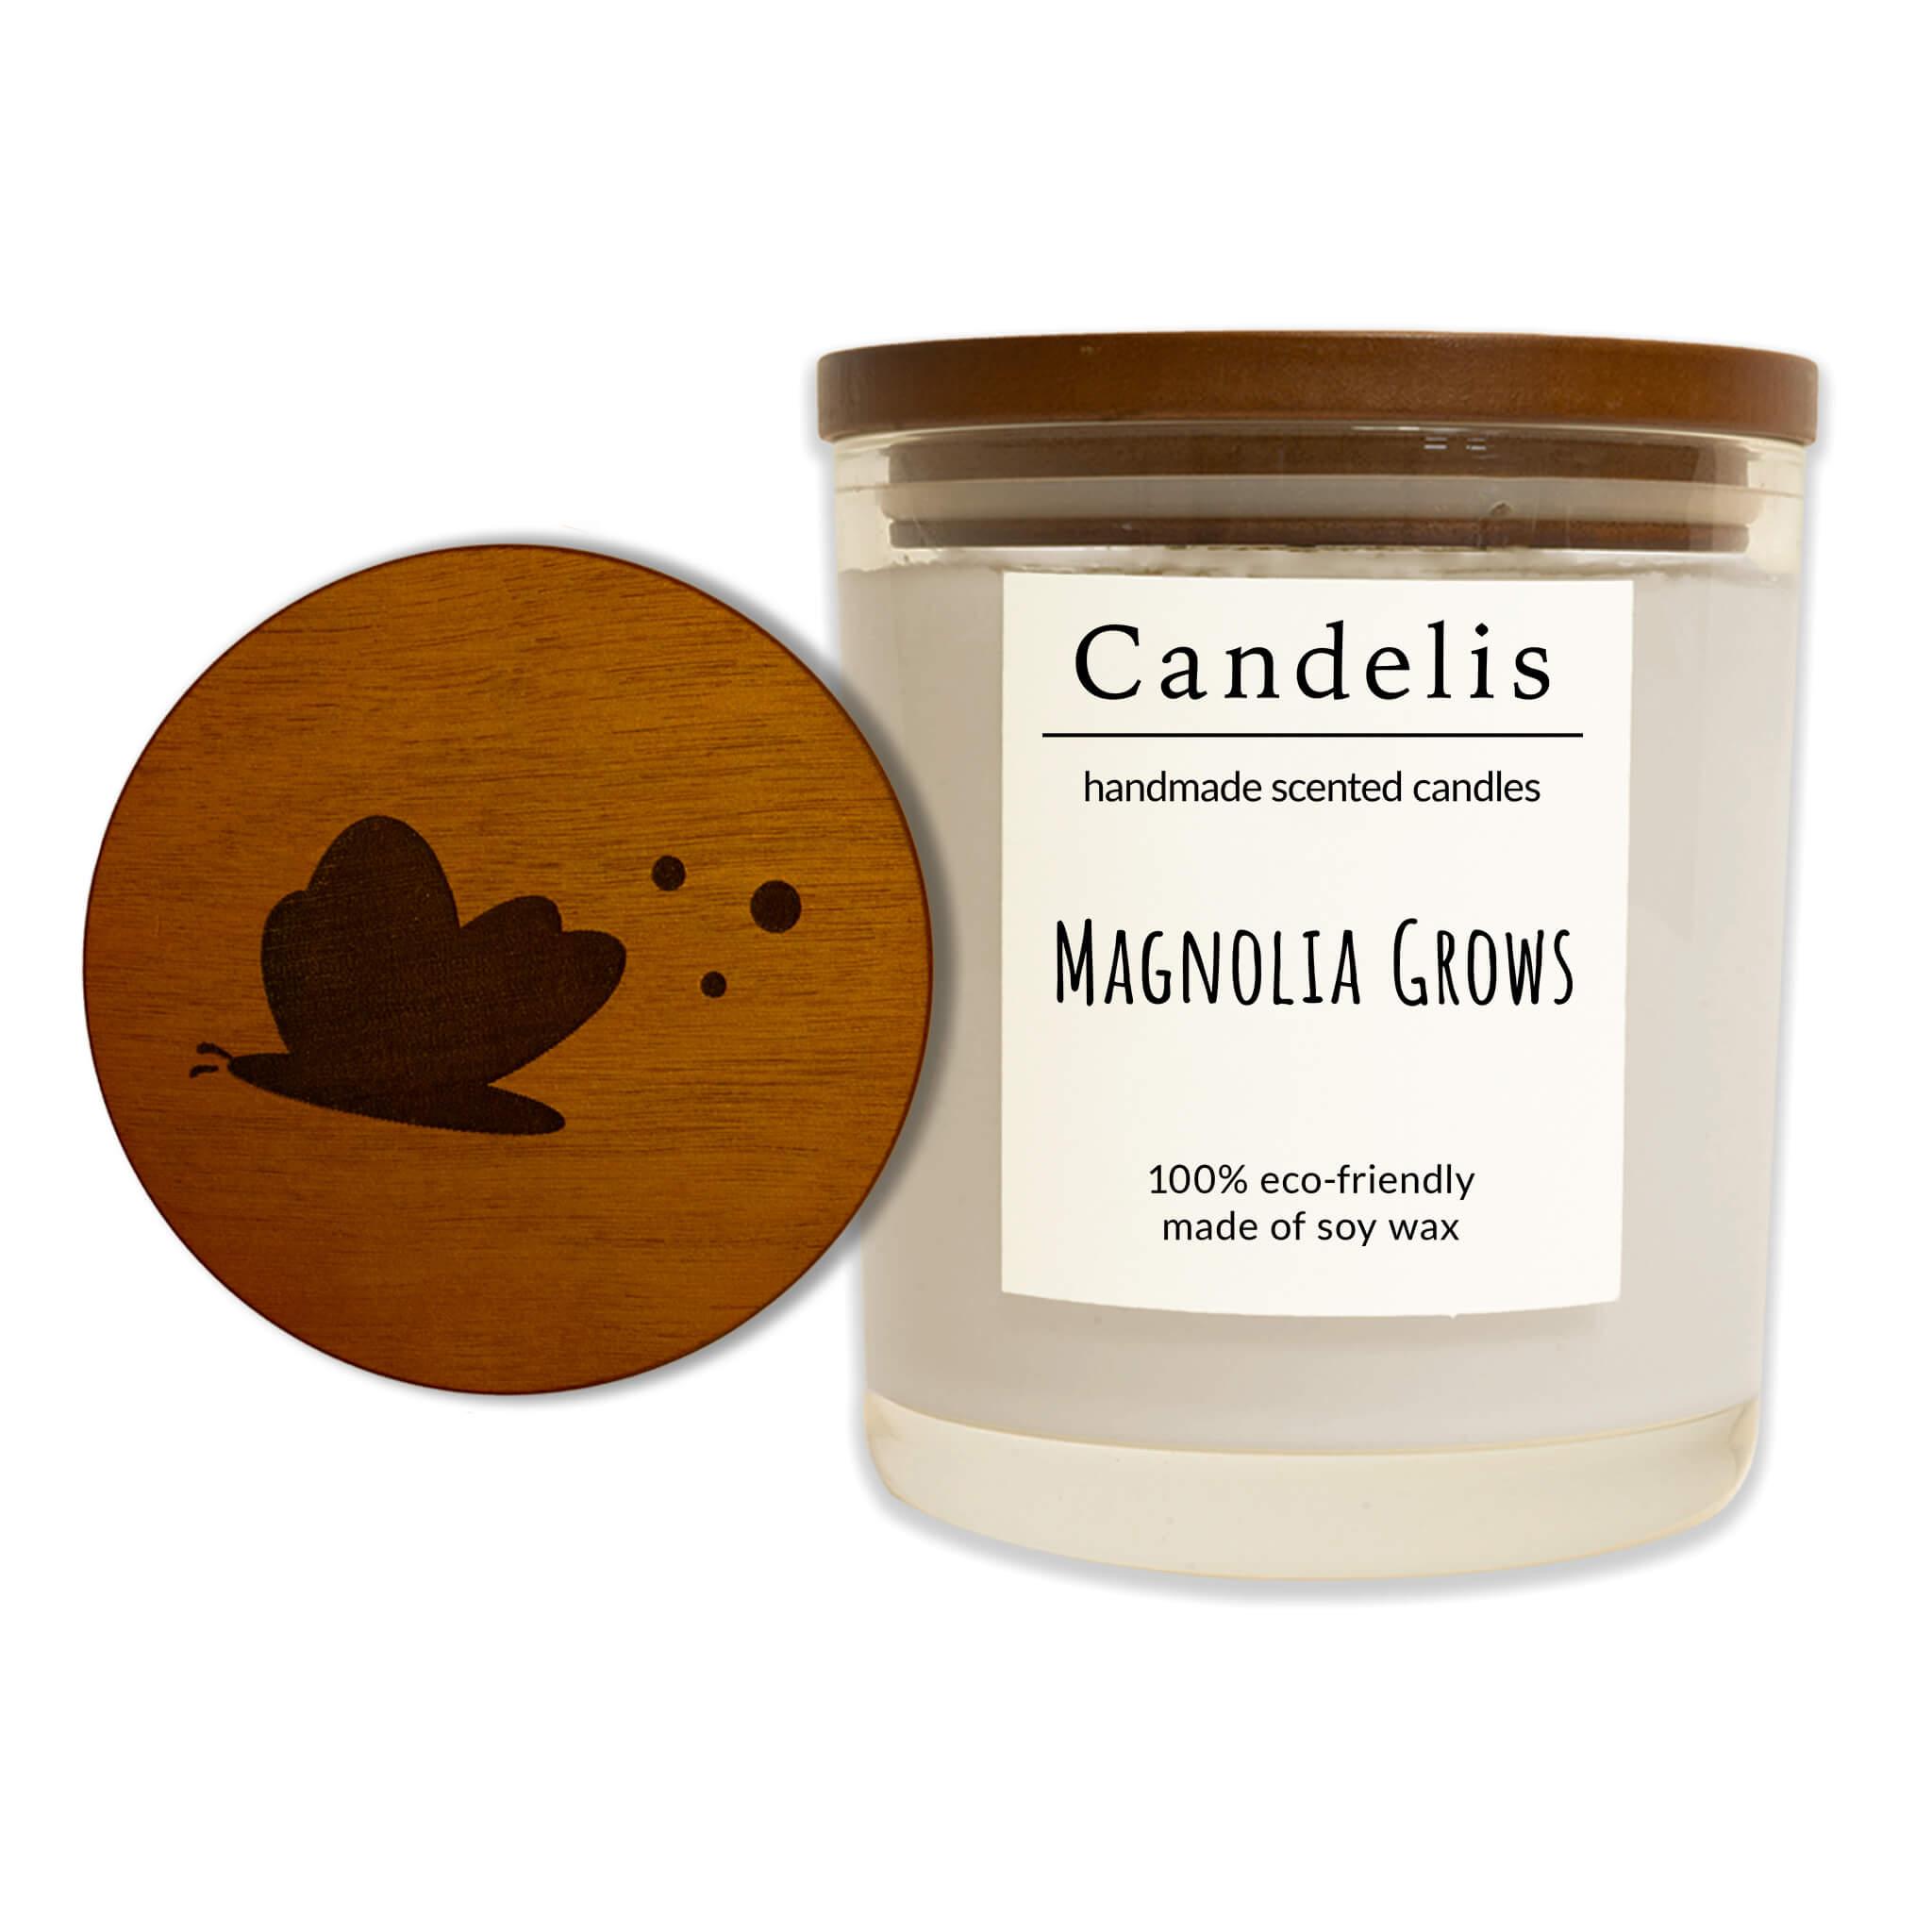 Magnolia Grows basis collectie single